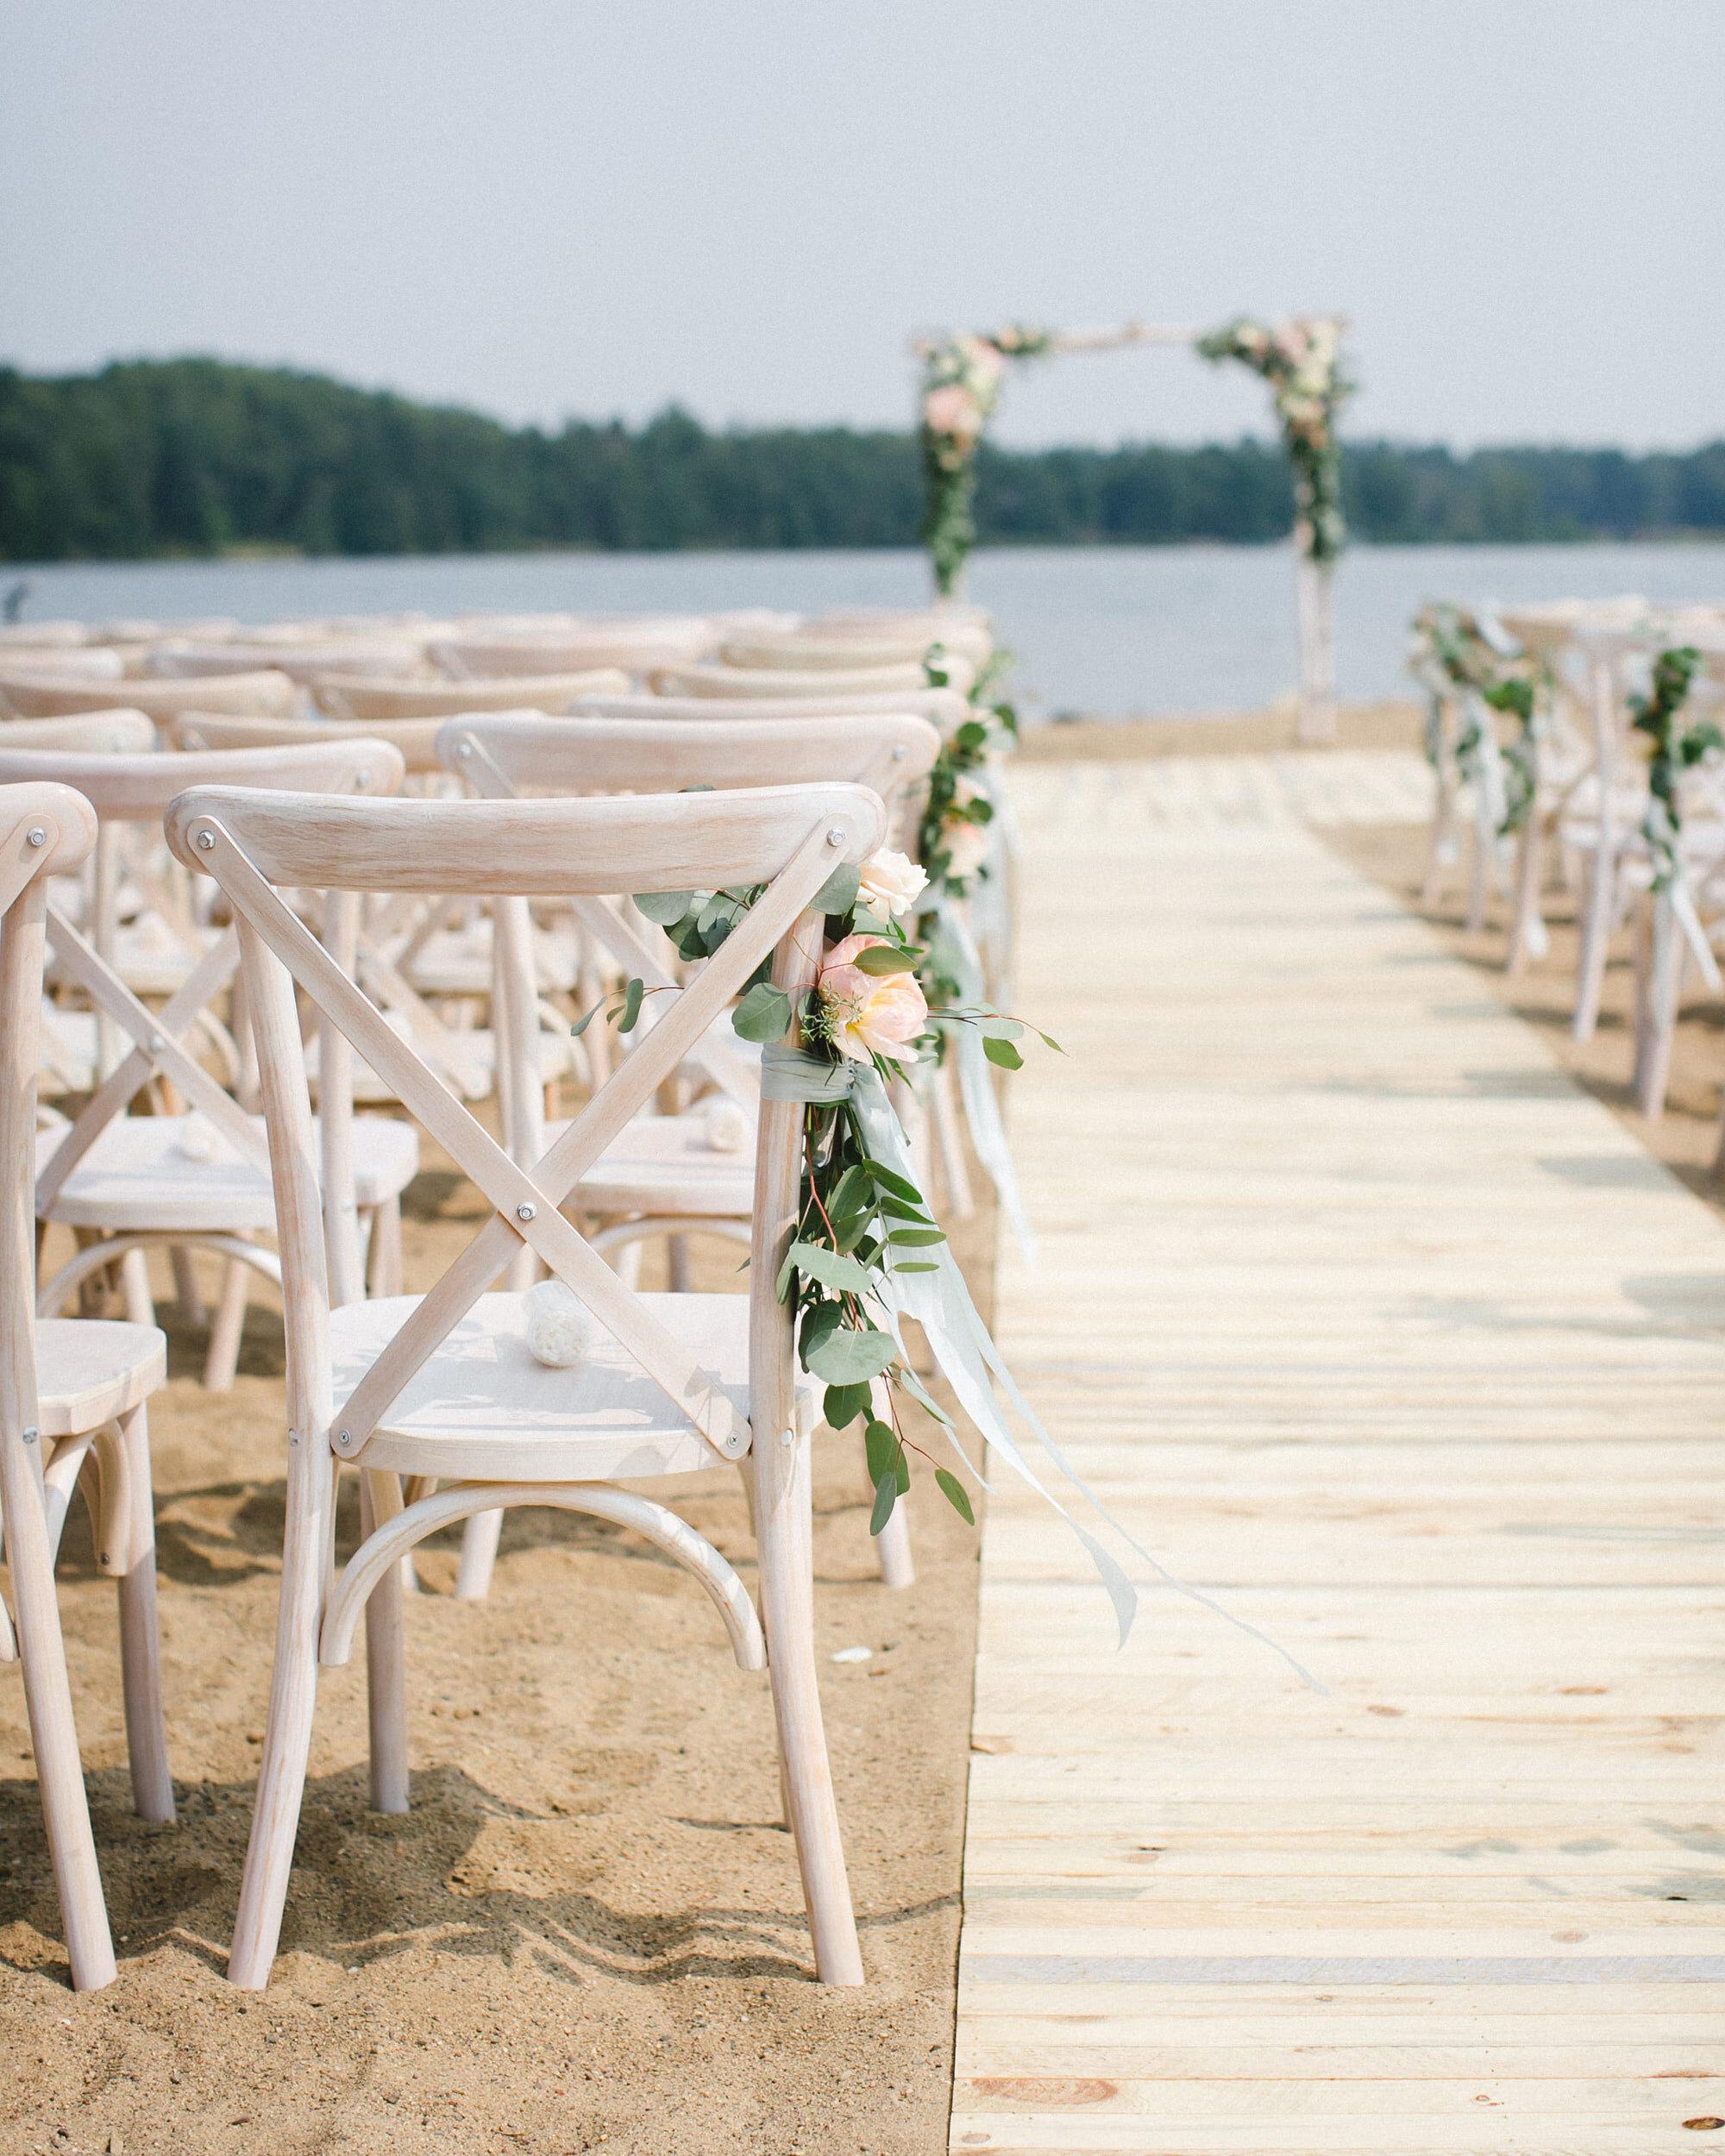 Butternut-Custom-Wood-Walkway-and-Chair-Rental-for-Beach-Ceremony-Farmhouse-Foundry.jpg